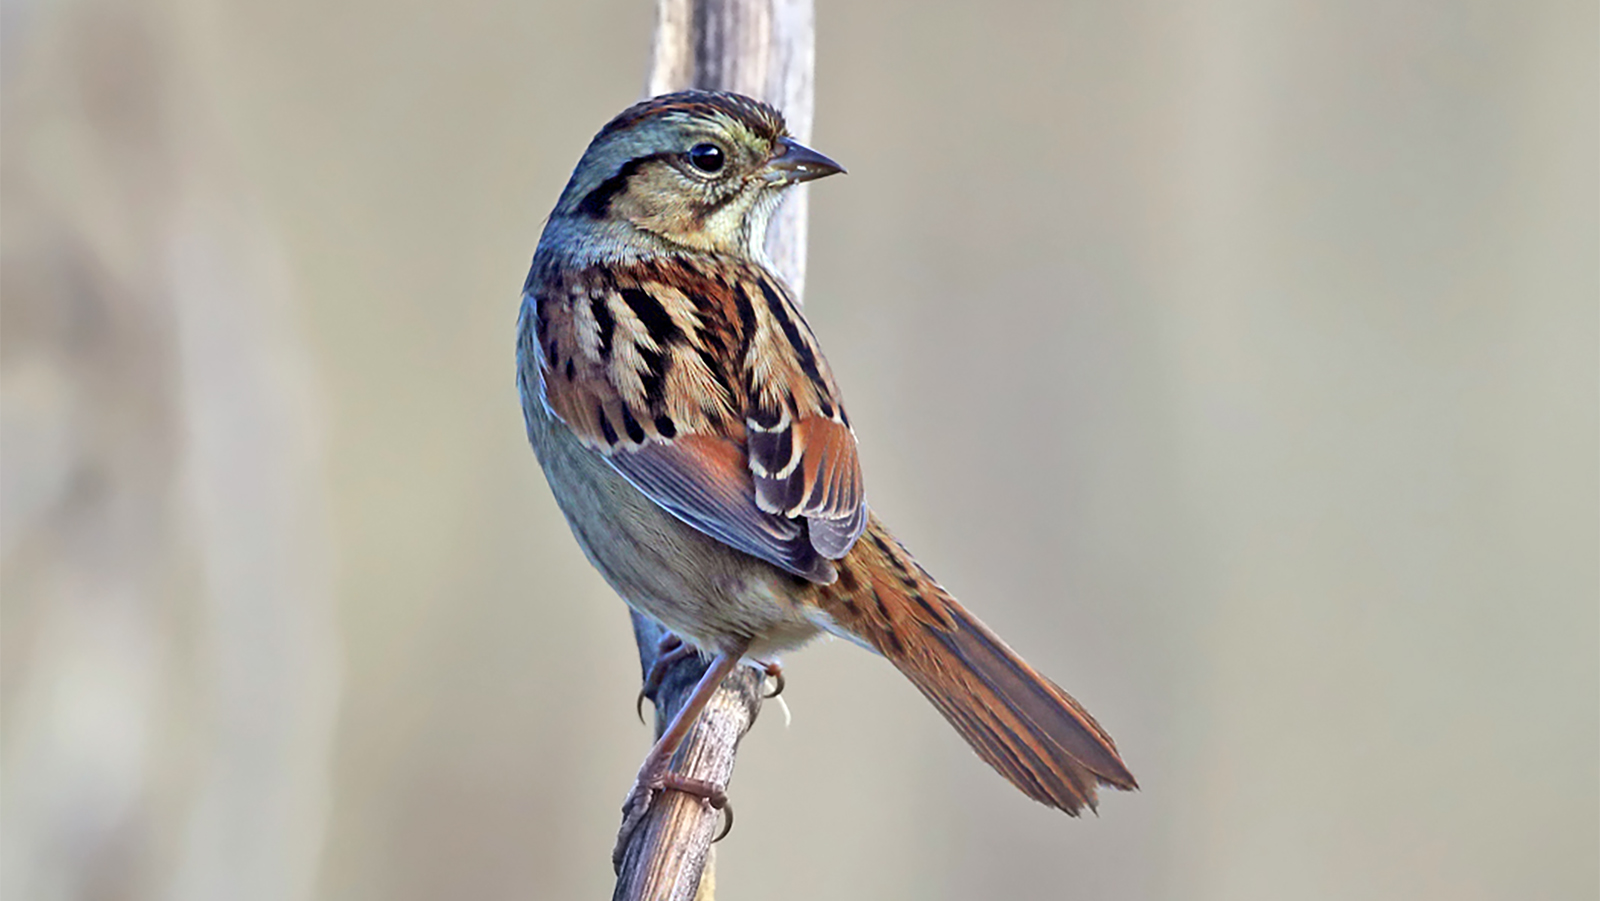 Swamp Sparrow by Tom Murray